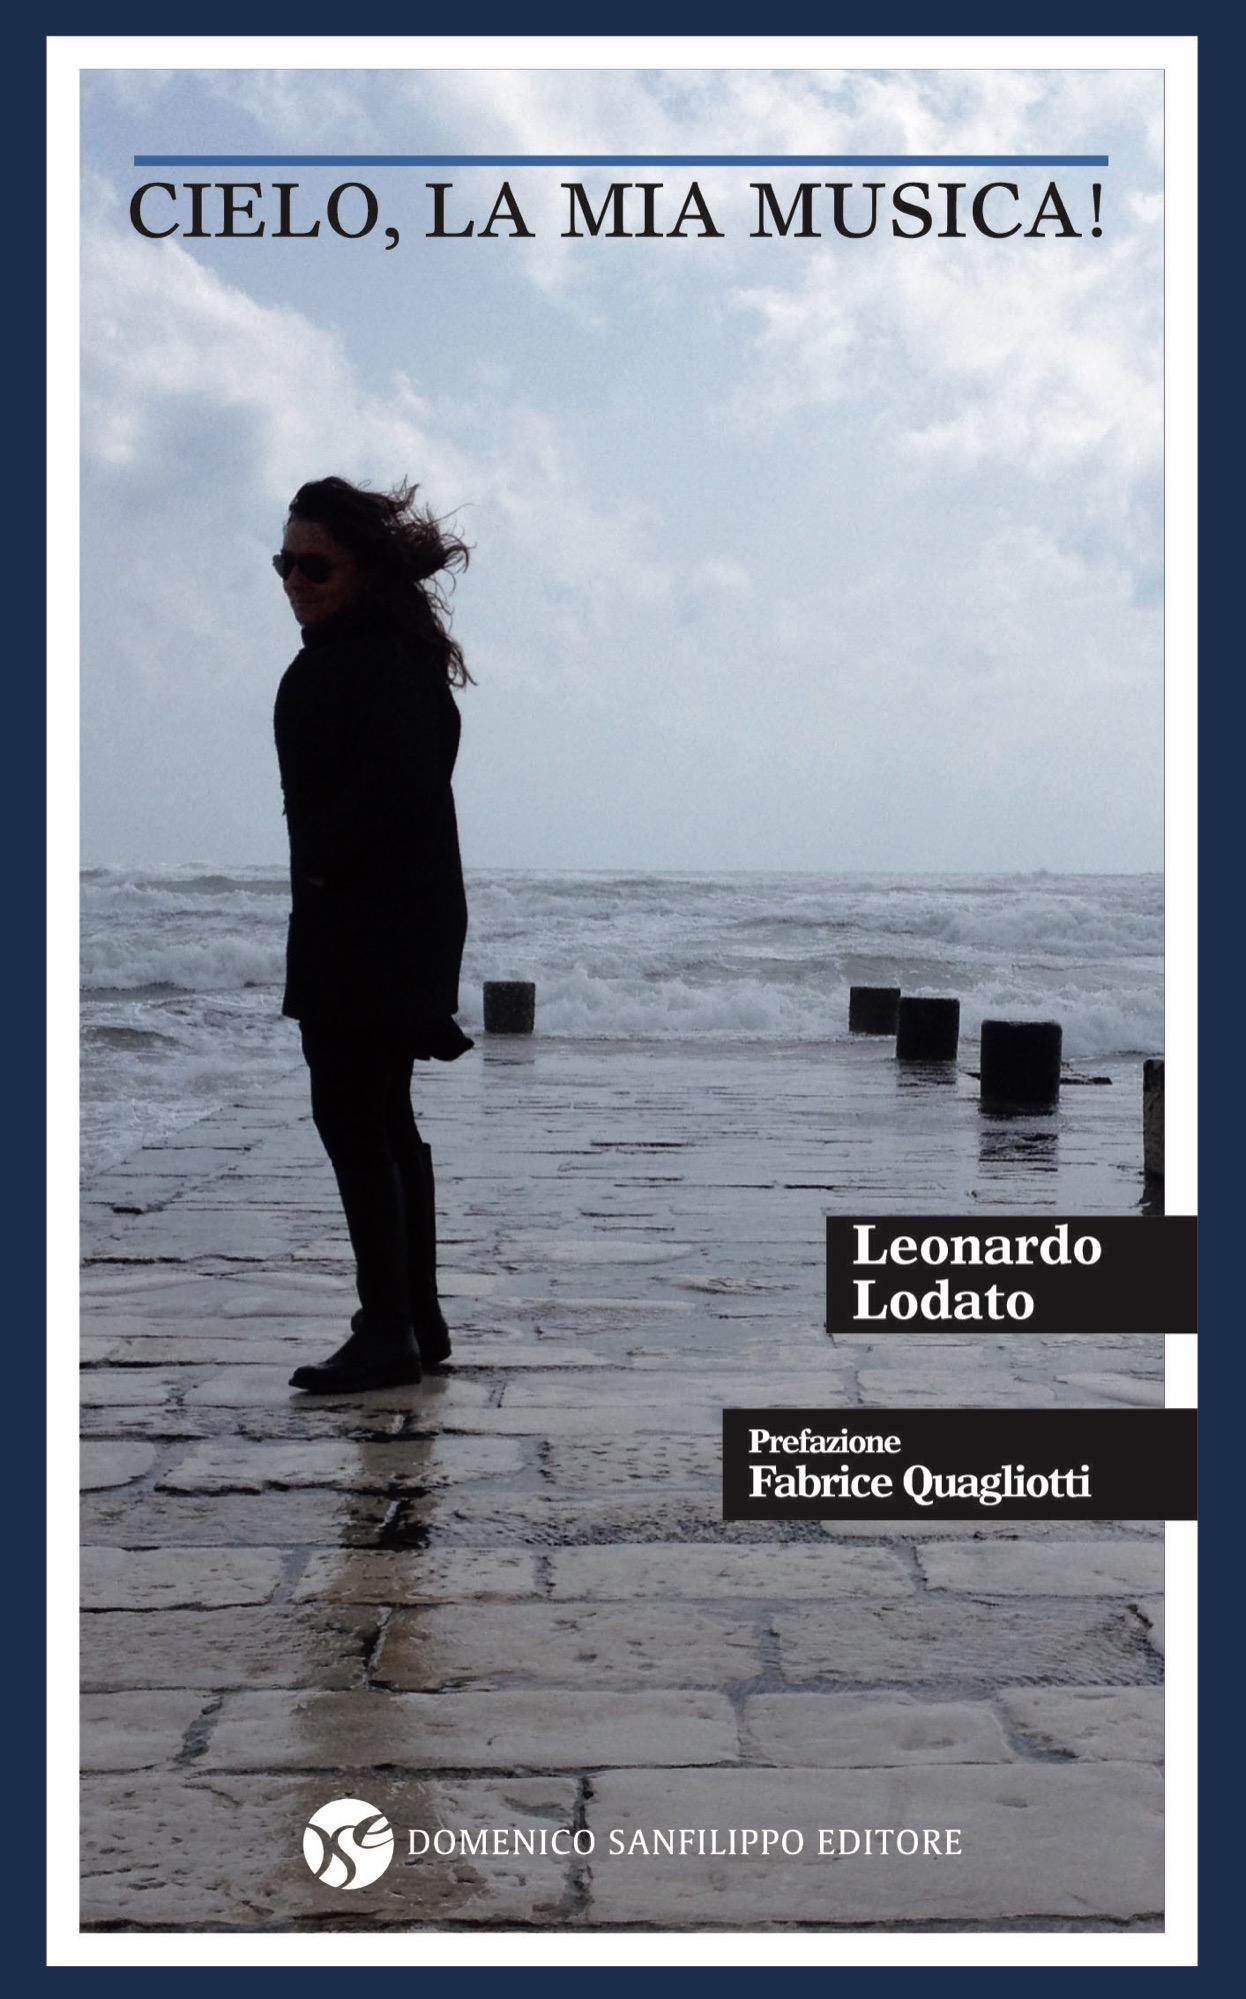 copertina-lodato-libro-dse-def-1594910735.jpg